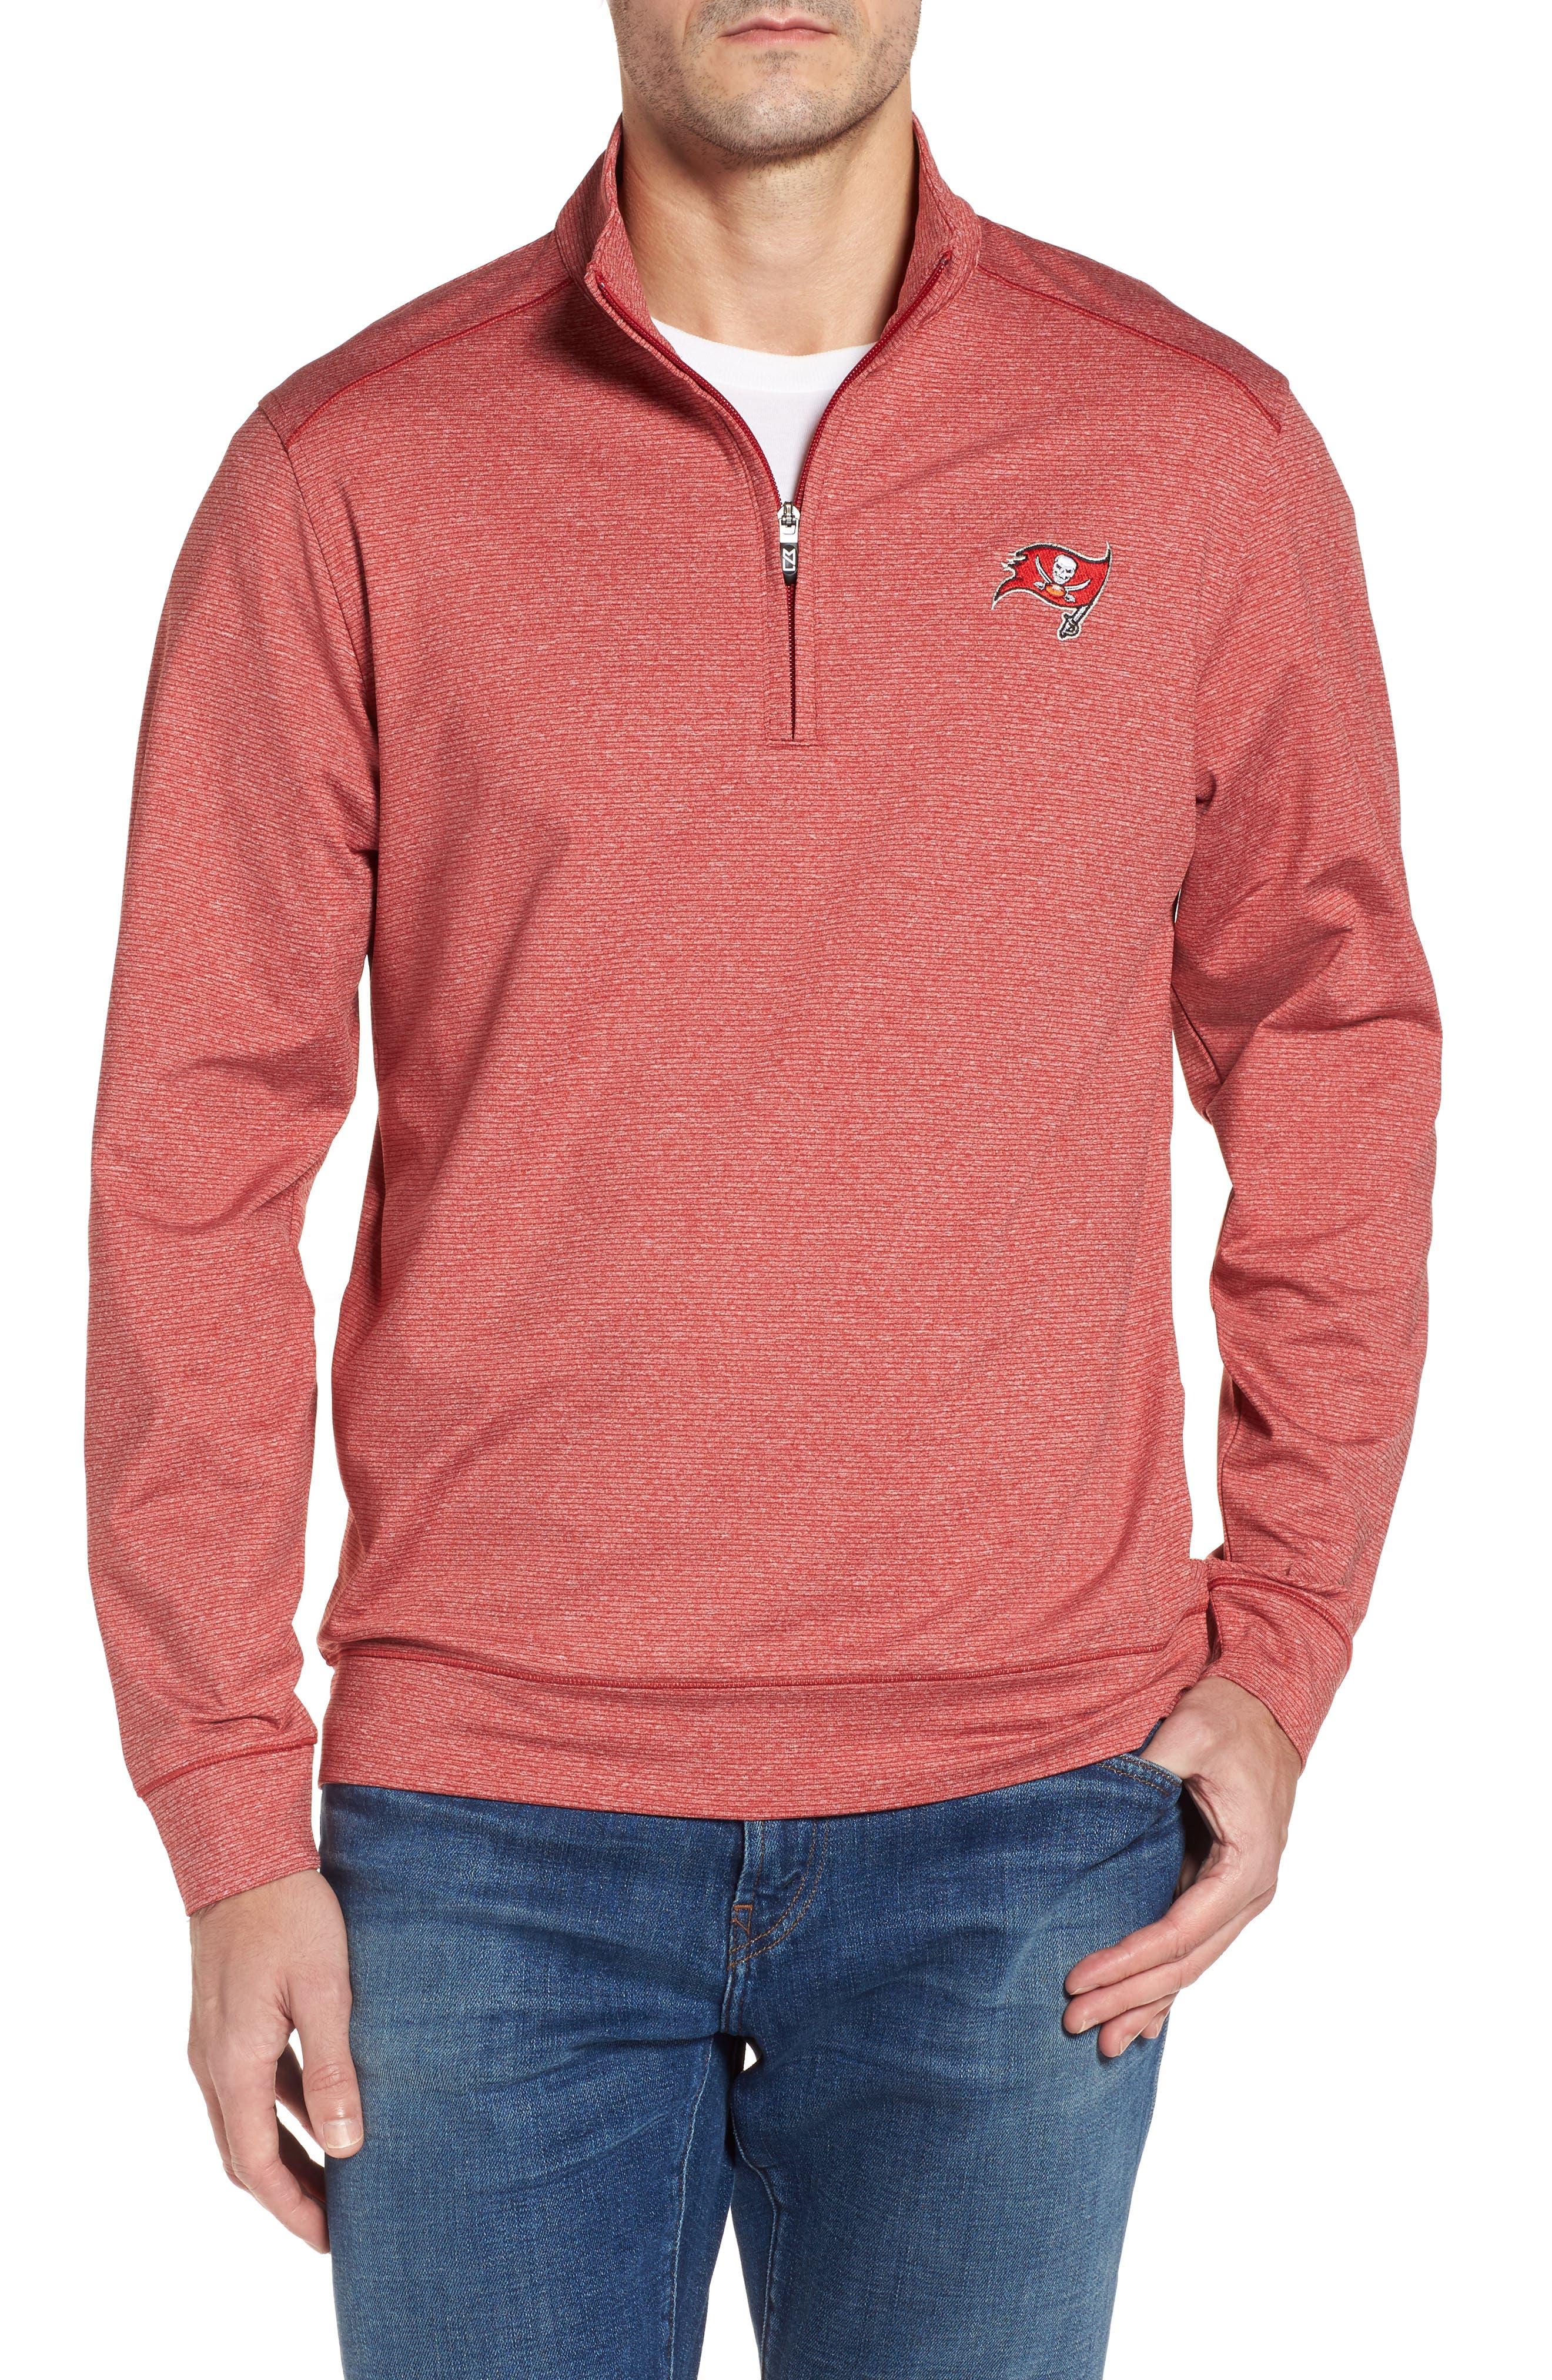 Shoreline - Tampa Bay Buccaneers Half Zip Pullover,                         Main,                         color, Cardinal Red Heather